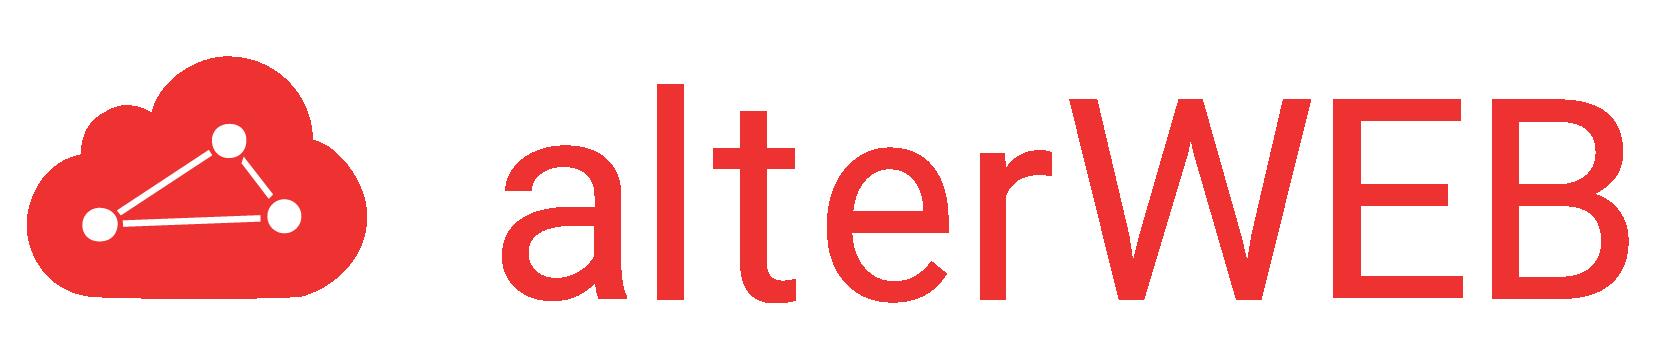 Alterweb-01